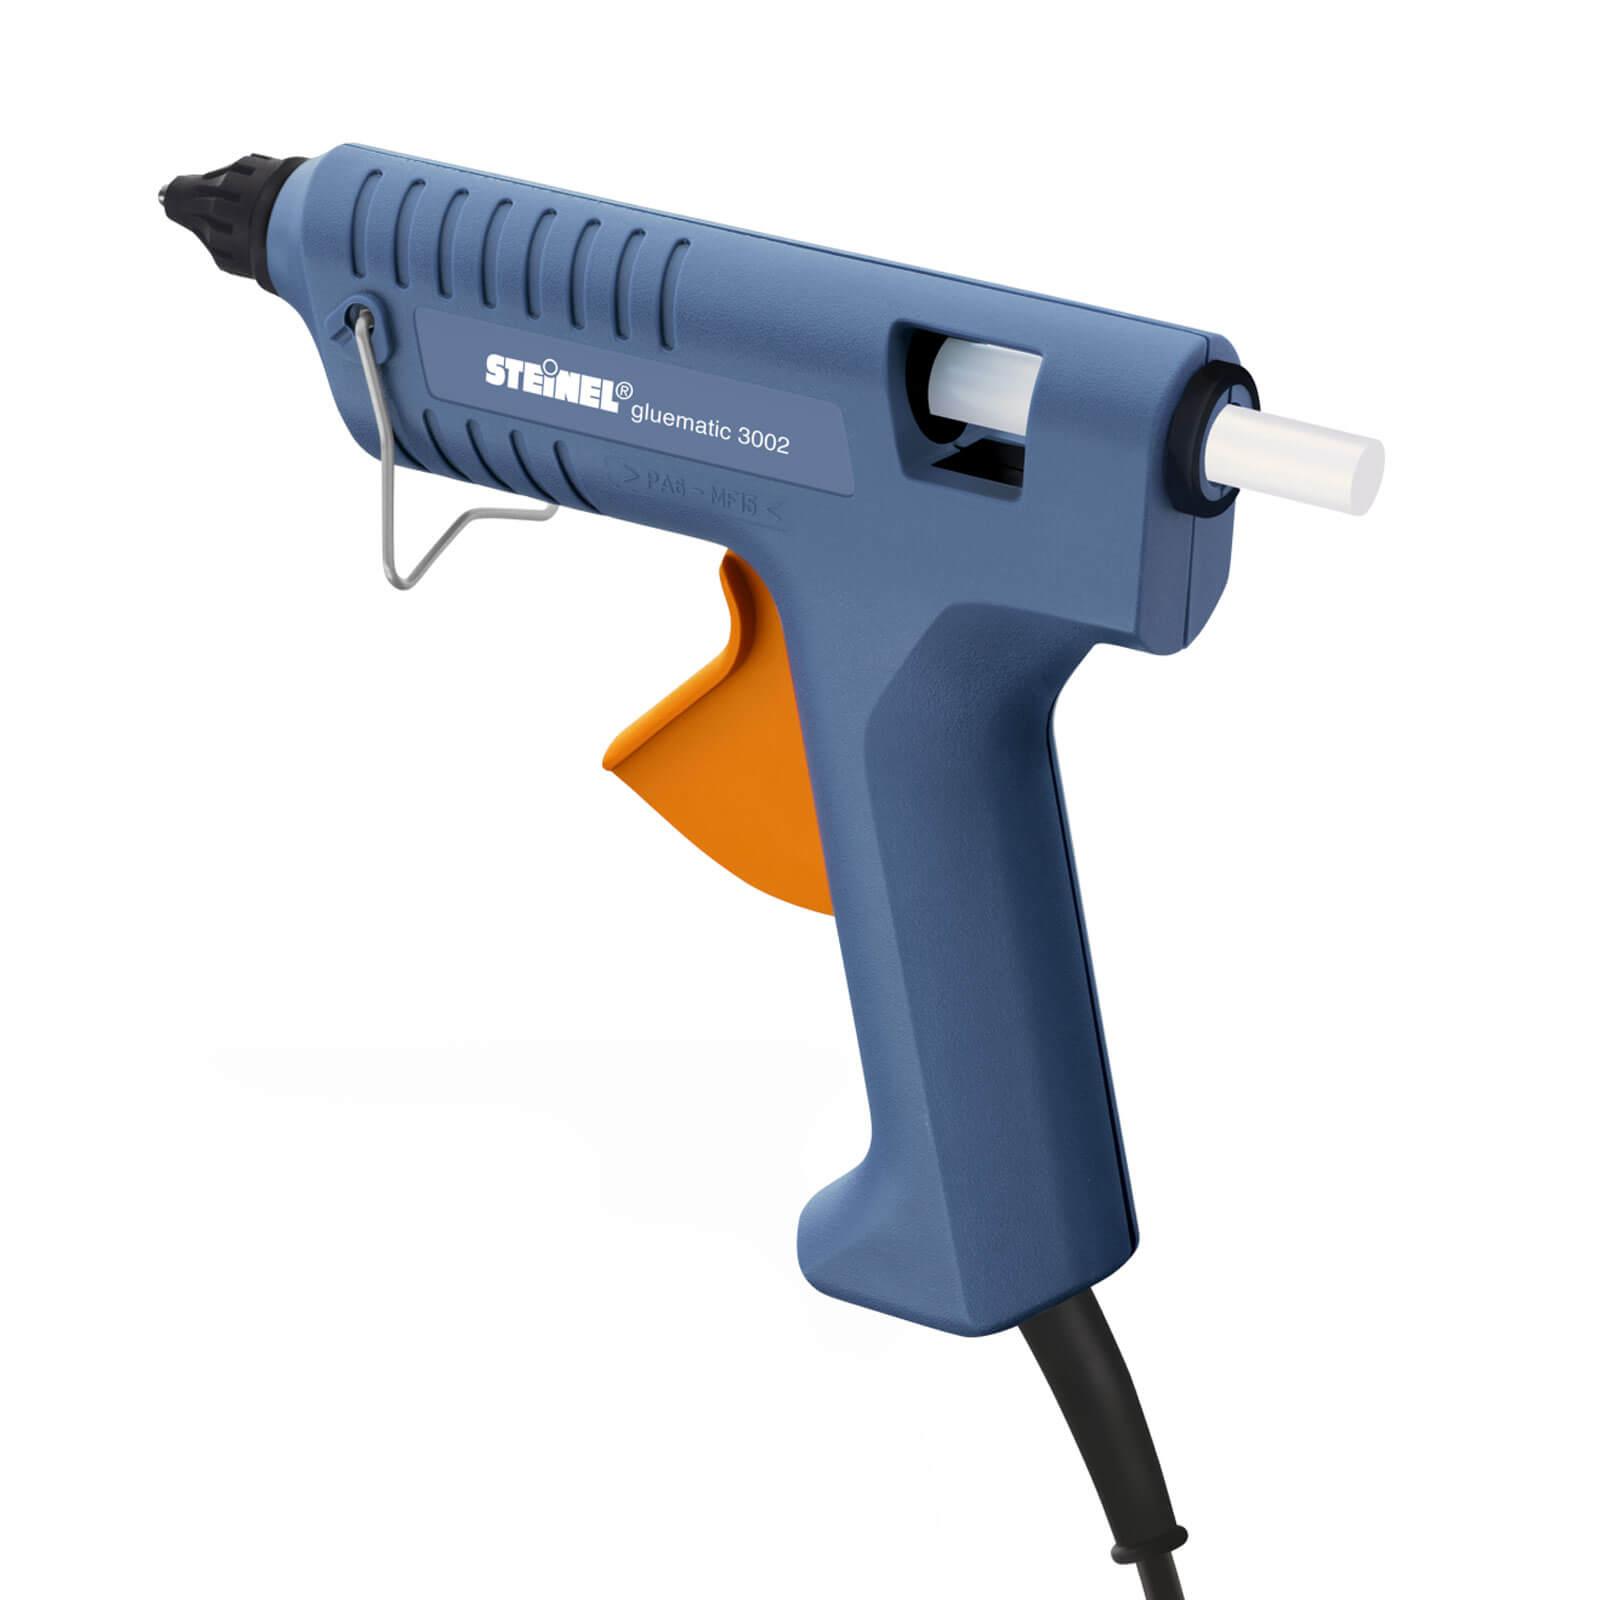 Steinel GLUEMATIC 3002 DIY Hot Melt Glue Gun 240v